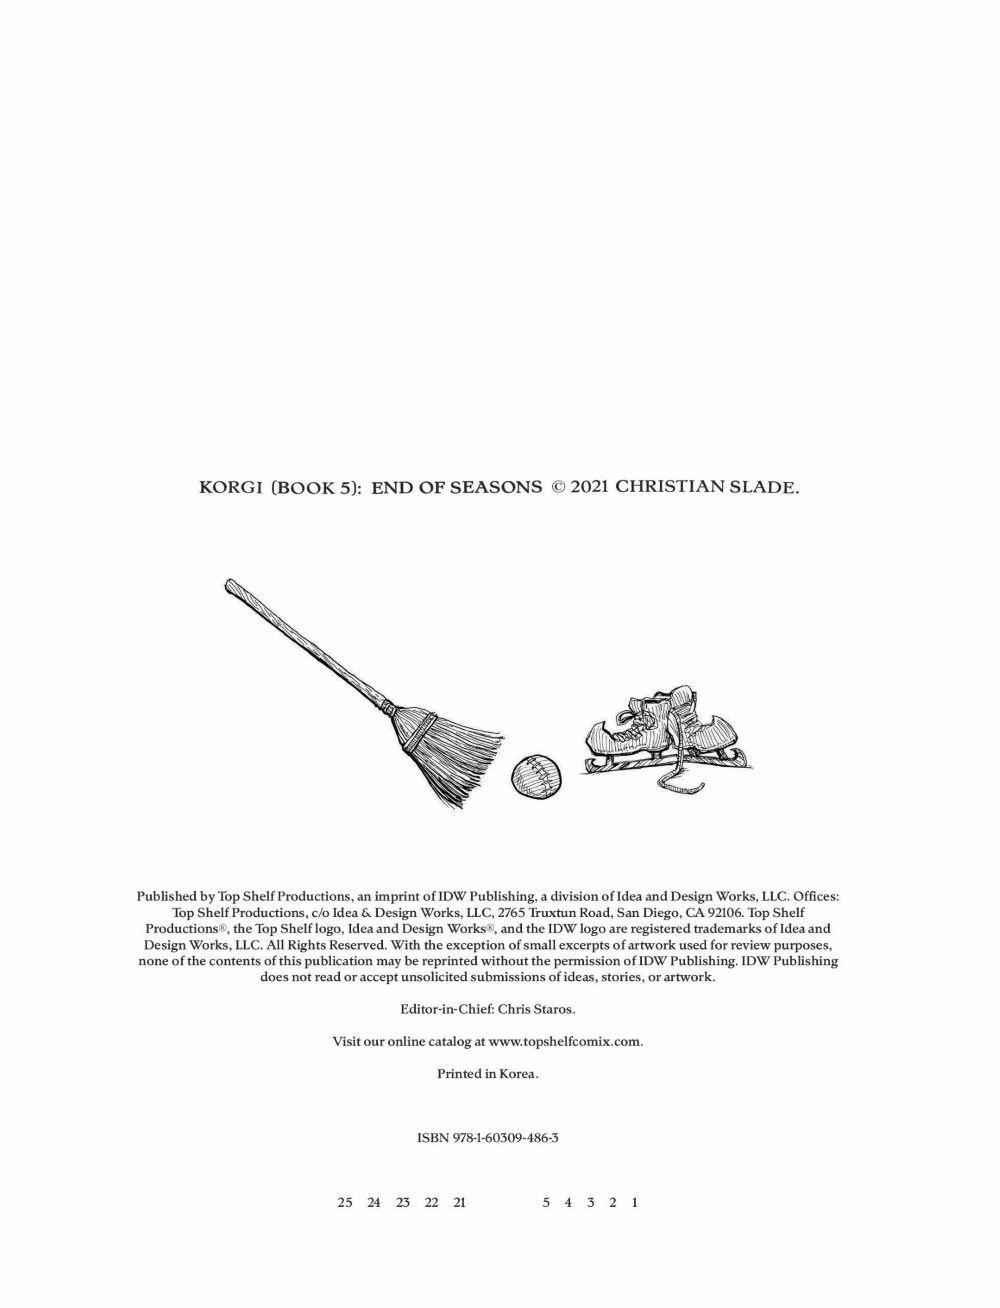 Korgi-Book-05_pr-2 ComicList Previews: KORGI VOLUME 5 END OF SEASONS GN